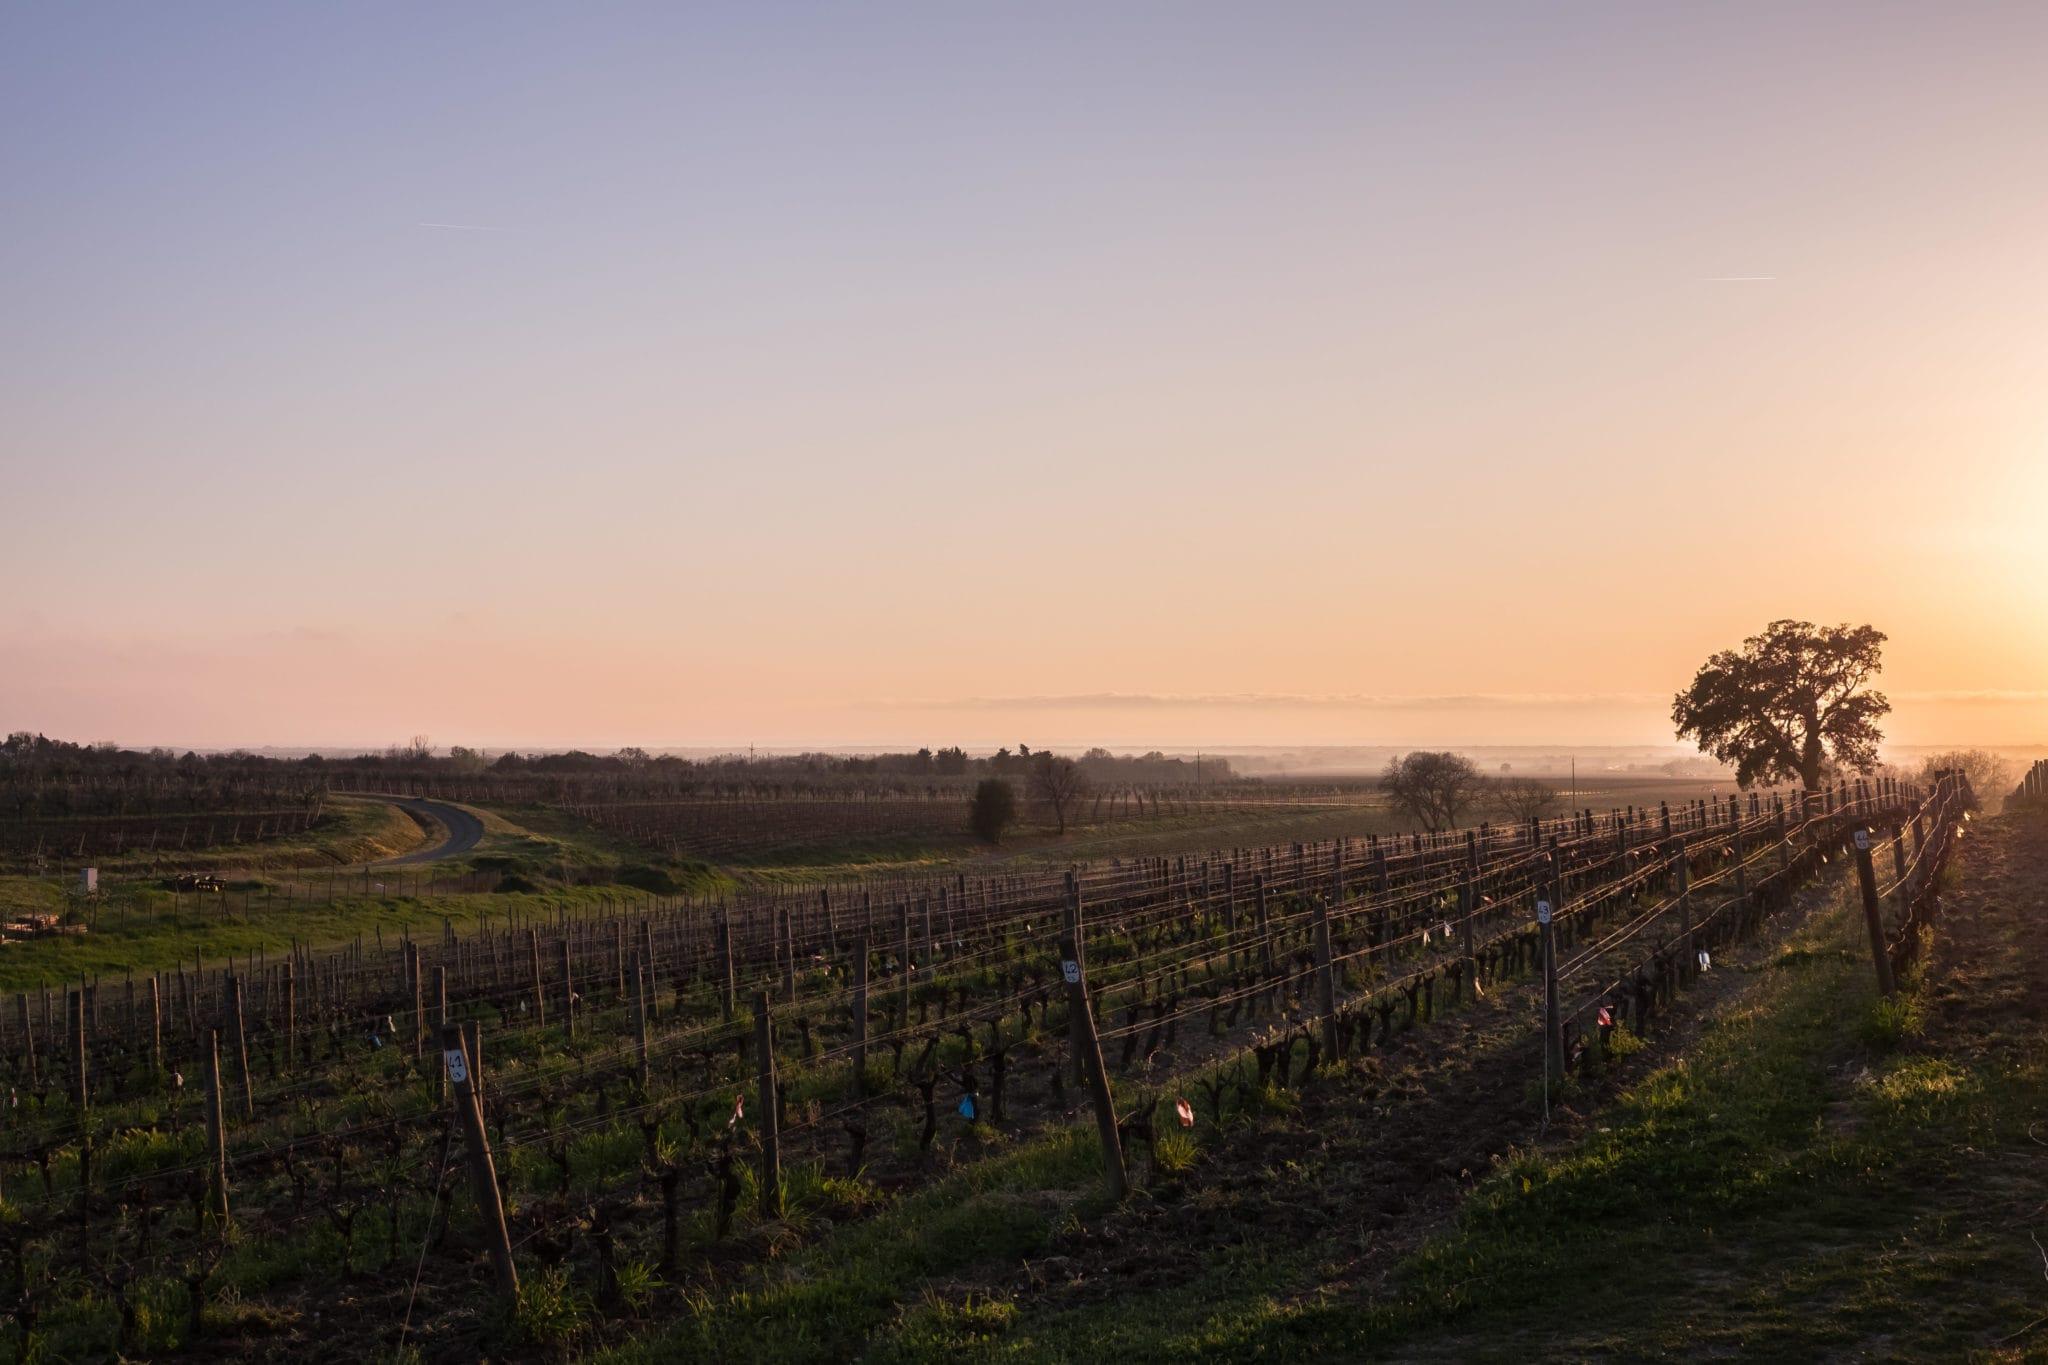 Sunset at the vineyard in Bolgheri Tuscany